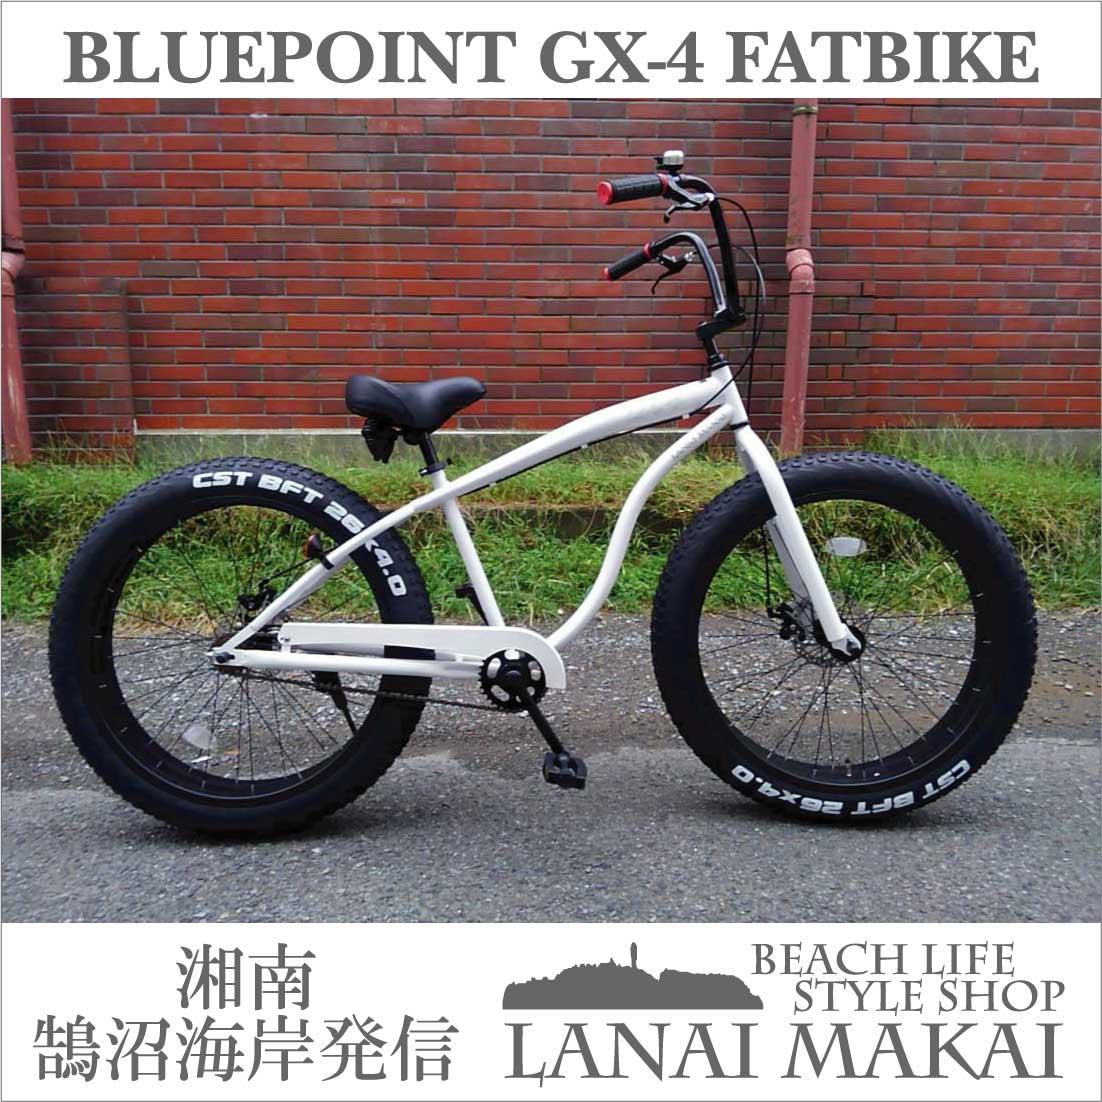 "【BLUEPOINT】""GX4-BeachCruiser-FATBIKE""color:ホワイト湘南鵠沼海岸発信26インチビーチクルーザーファットバイク自転車 ファットバイク ビーチクルーザー 極太"